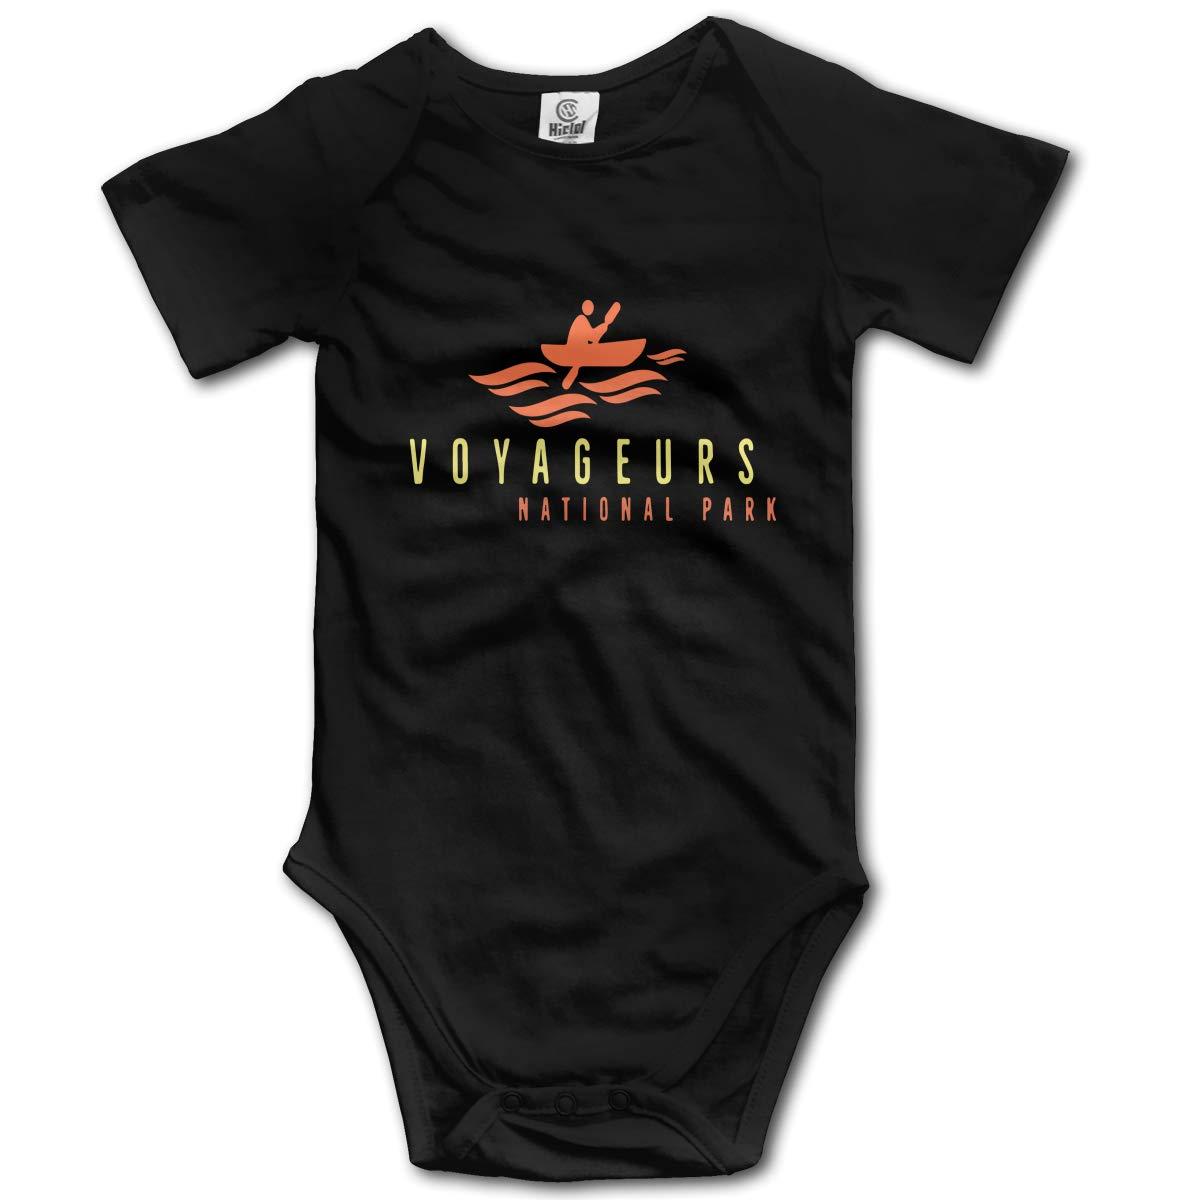 Toddler Voyageurs National Park Short Sleeve Climbing Clothes Creeper Jumpsuits Suit 6-24 Months